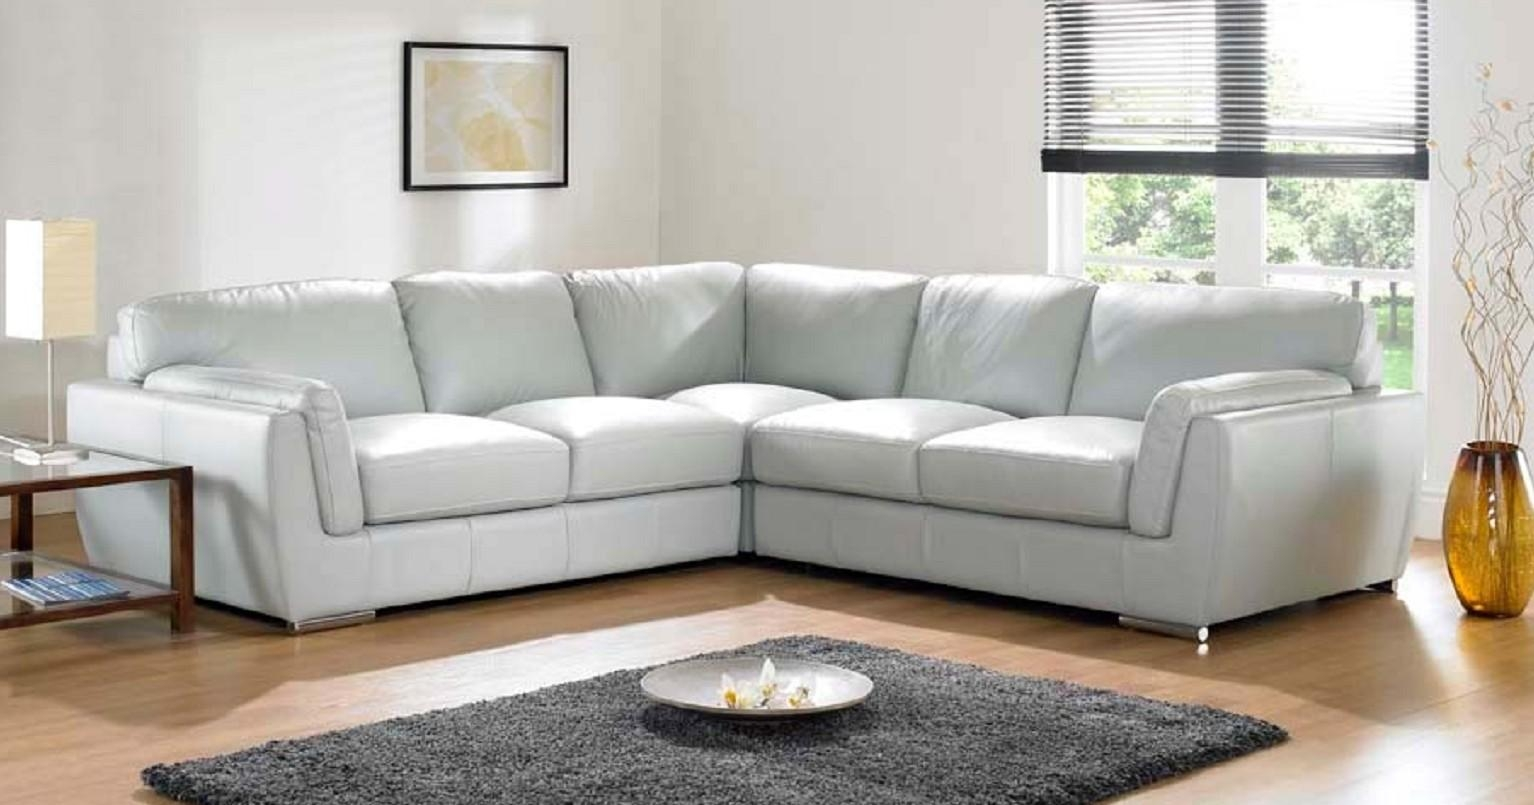 Leather Corner Sofa Grey | Tehranmix Decoration Regarding White Leather Corner Sofa (View 13 of 20)